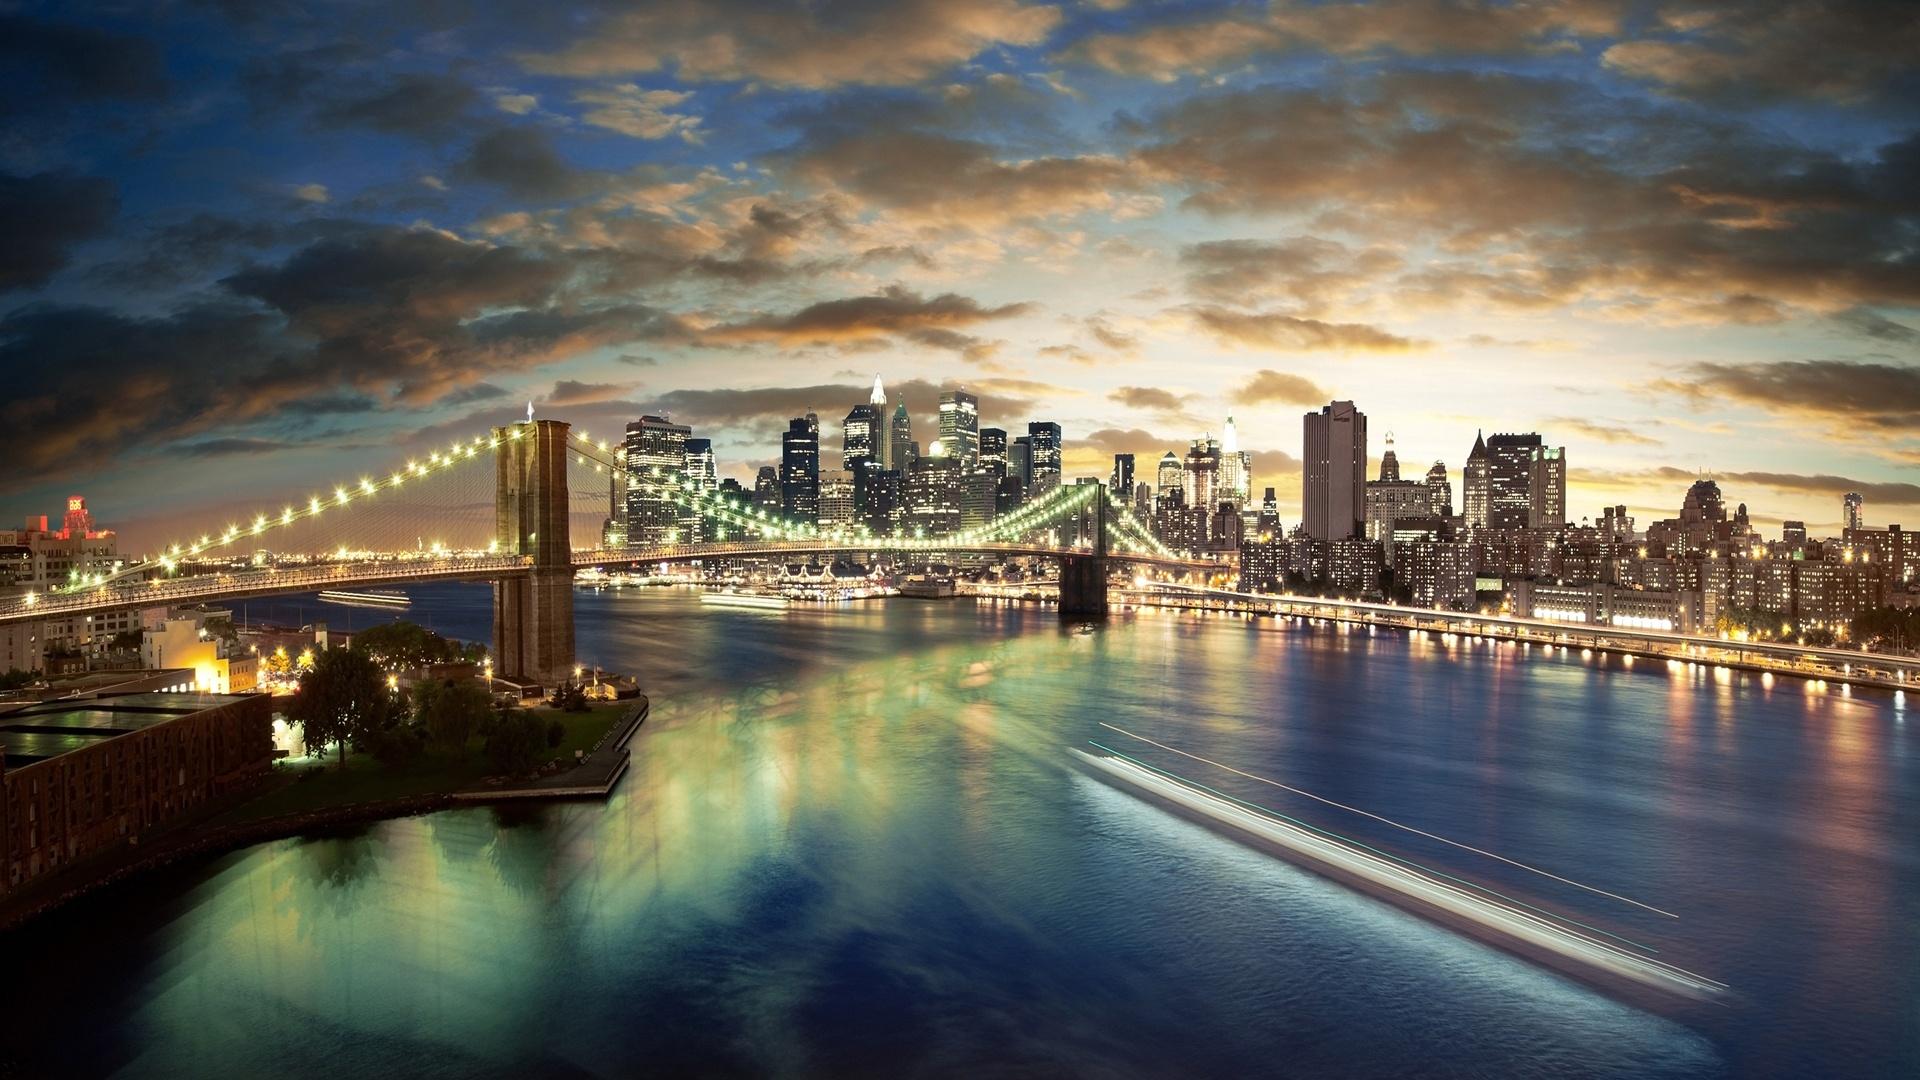 Free Download Sfondo Desktop New York Brooklyn Hd Wallpaper 1920x1080 For Your Desktop Mobile Tablet Explore 47 Nyc Hd Wallpaper New York Wallpaper For Walls Hd New York City